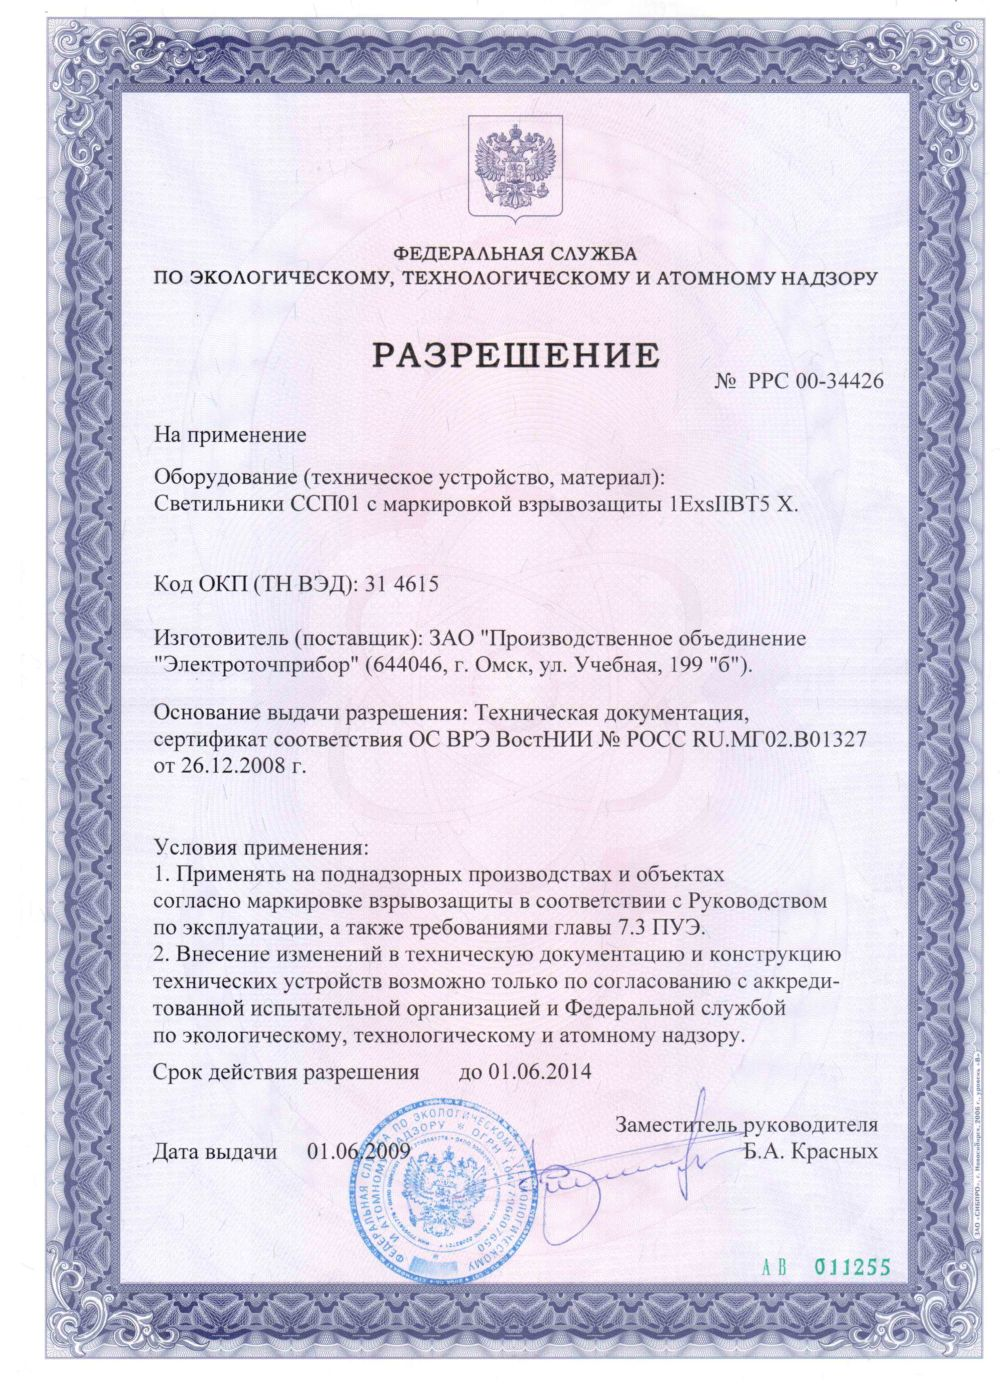 Сертификаты на продукцию FUNKE.